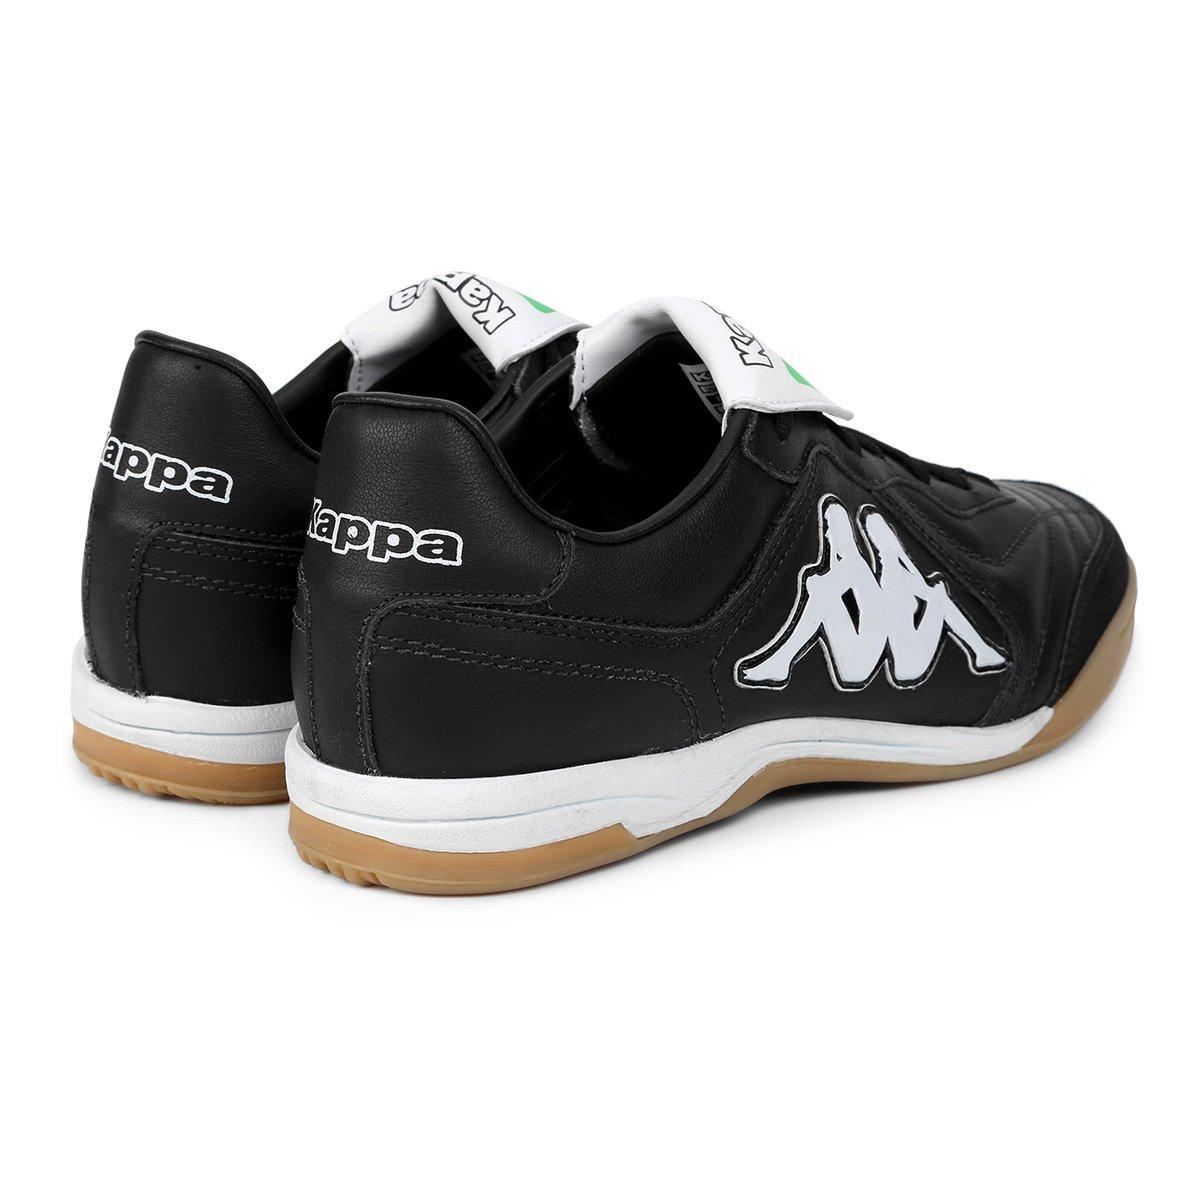 a4c164055c7ae Chuteira Futsal Kappa Pelle Couro - Preto - Compre Agora